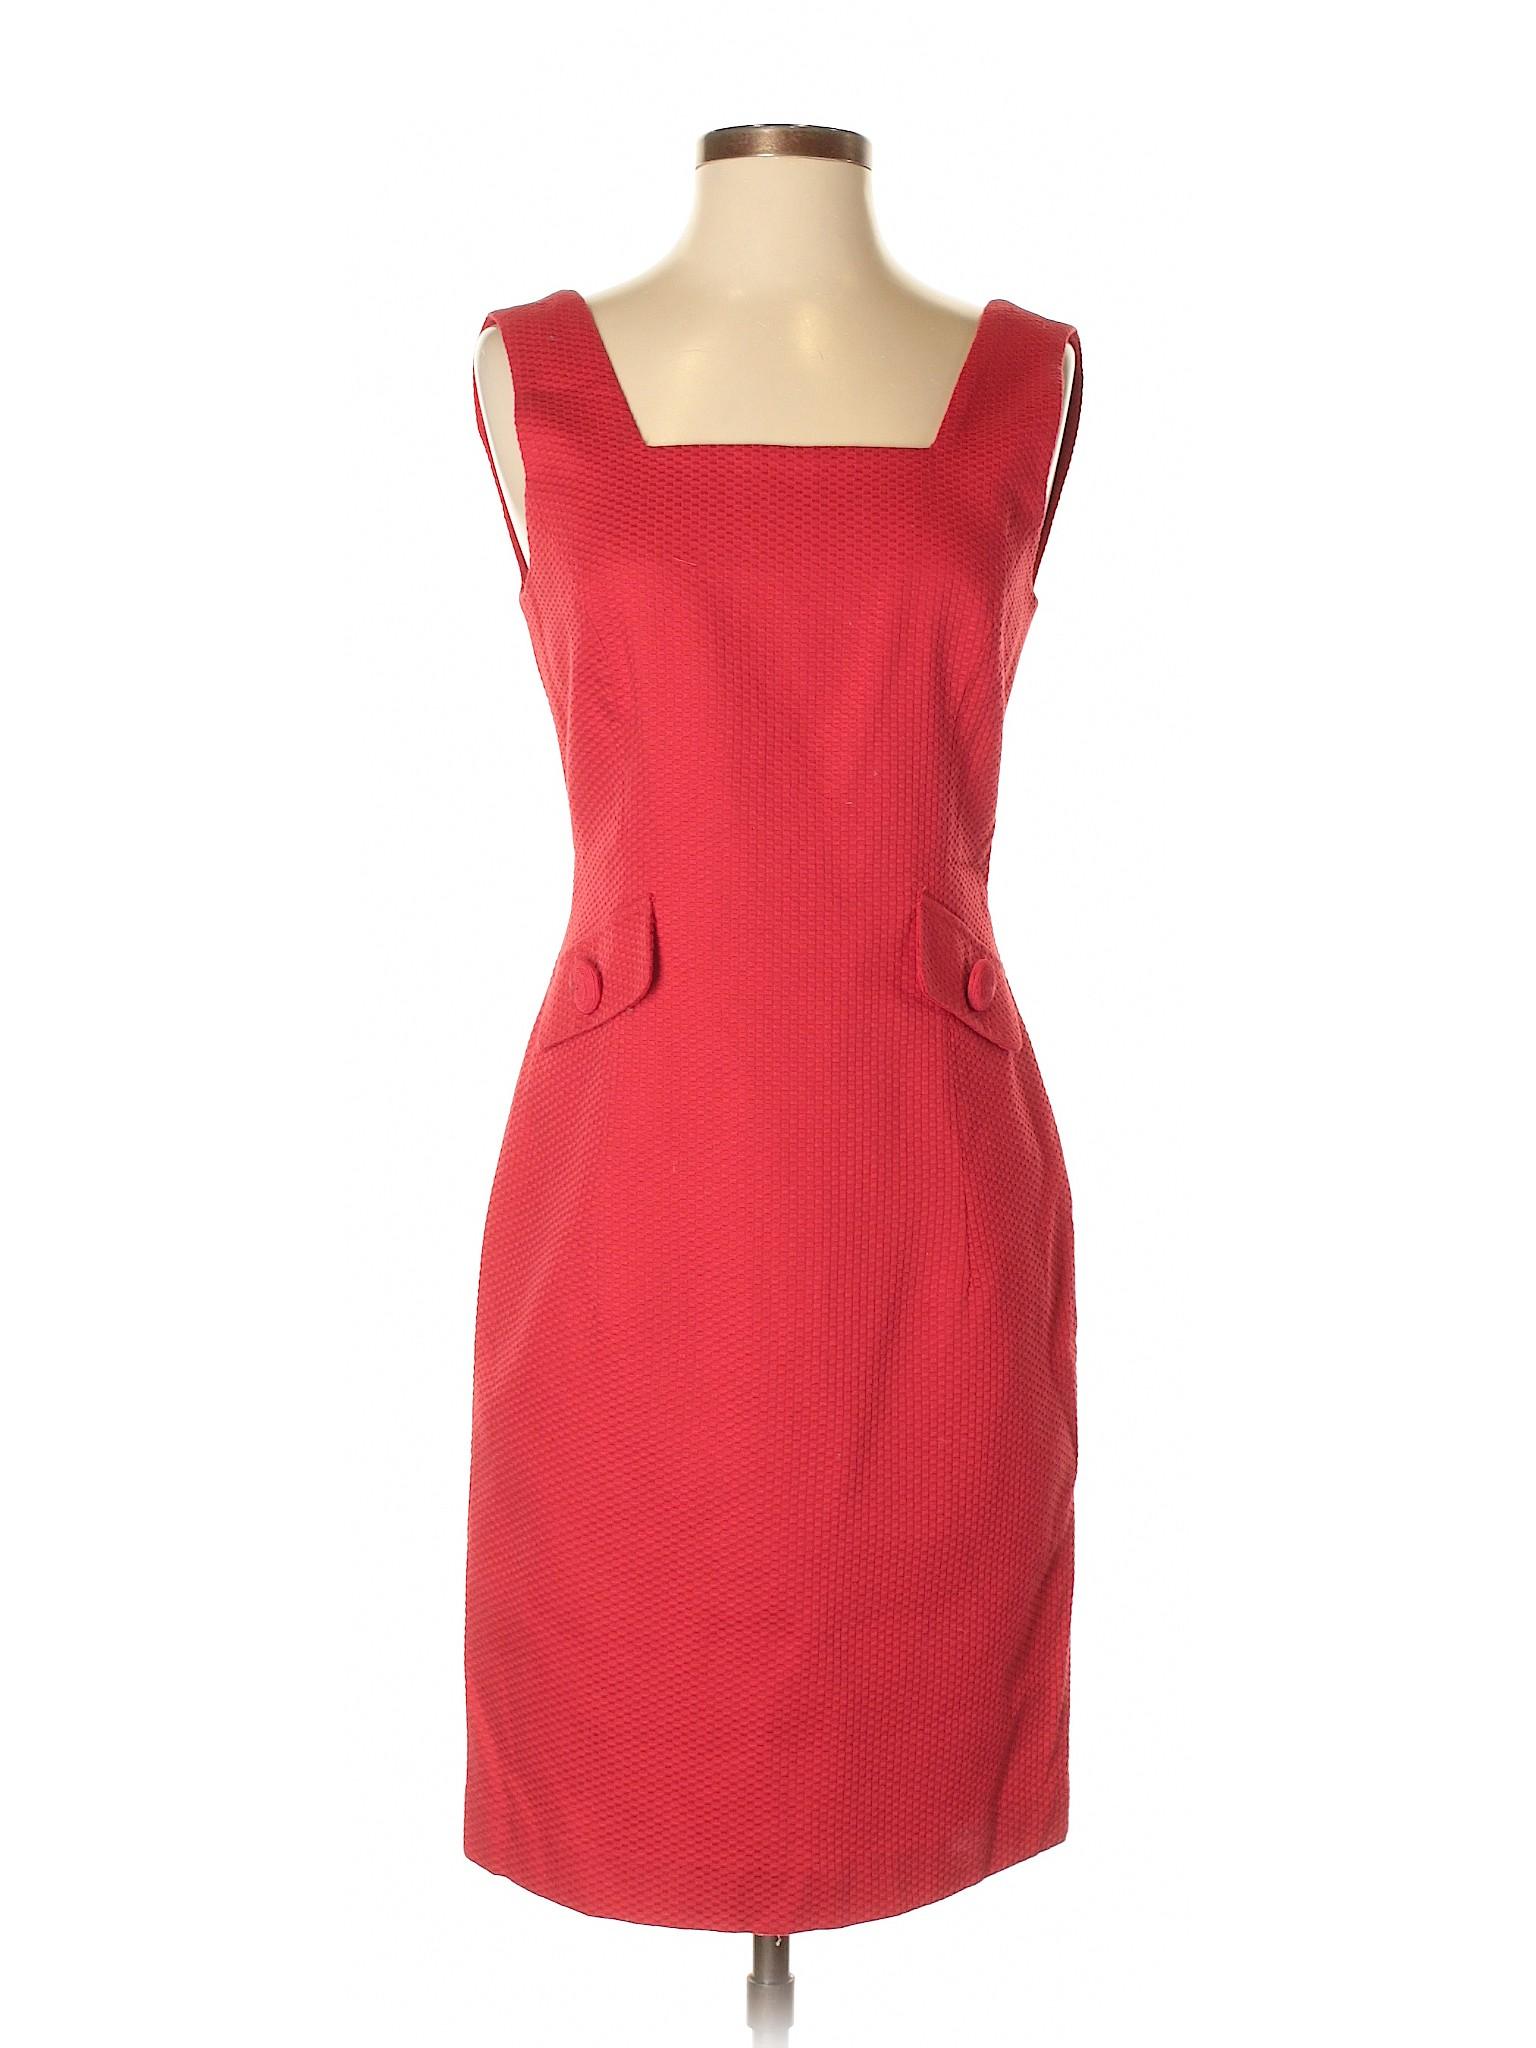 Casual Dress Boutique Andrea winter Jovine nY7nSzqU